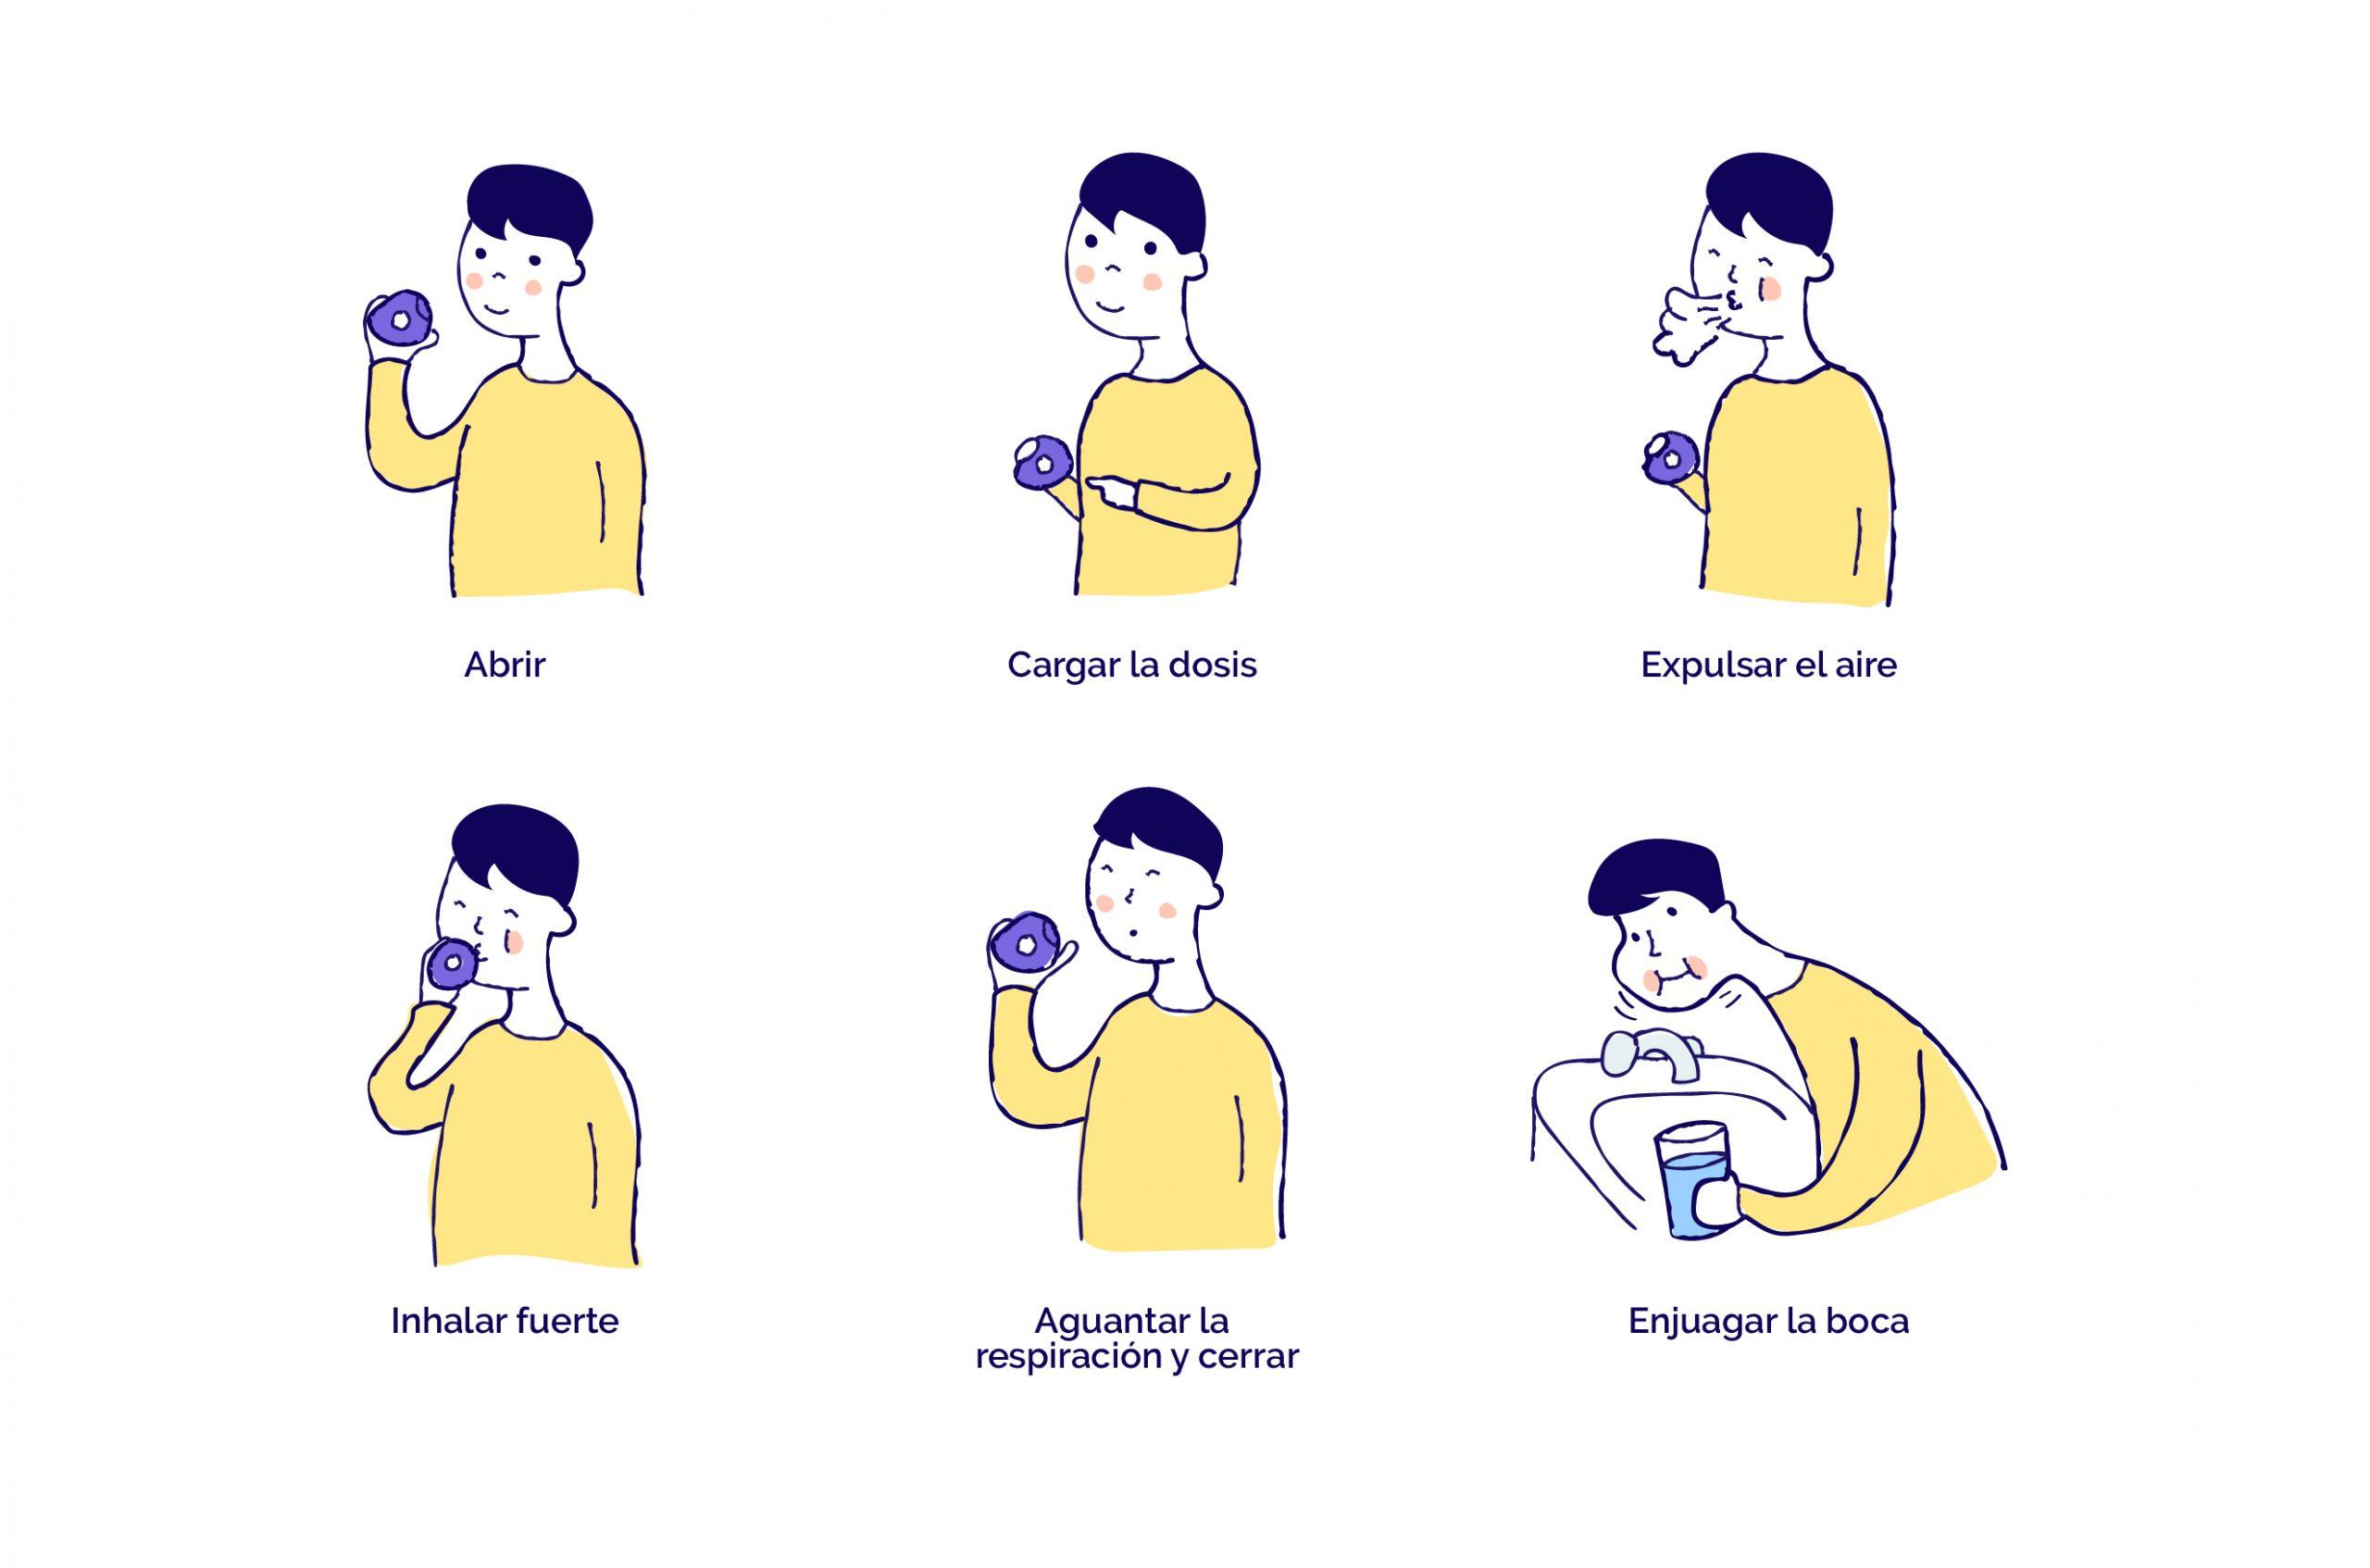 Tecnicas de inhalacion Accuhaler